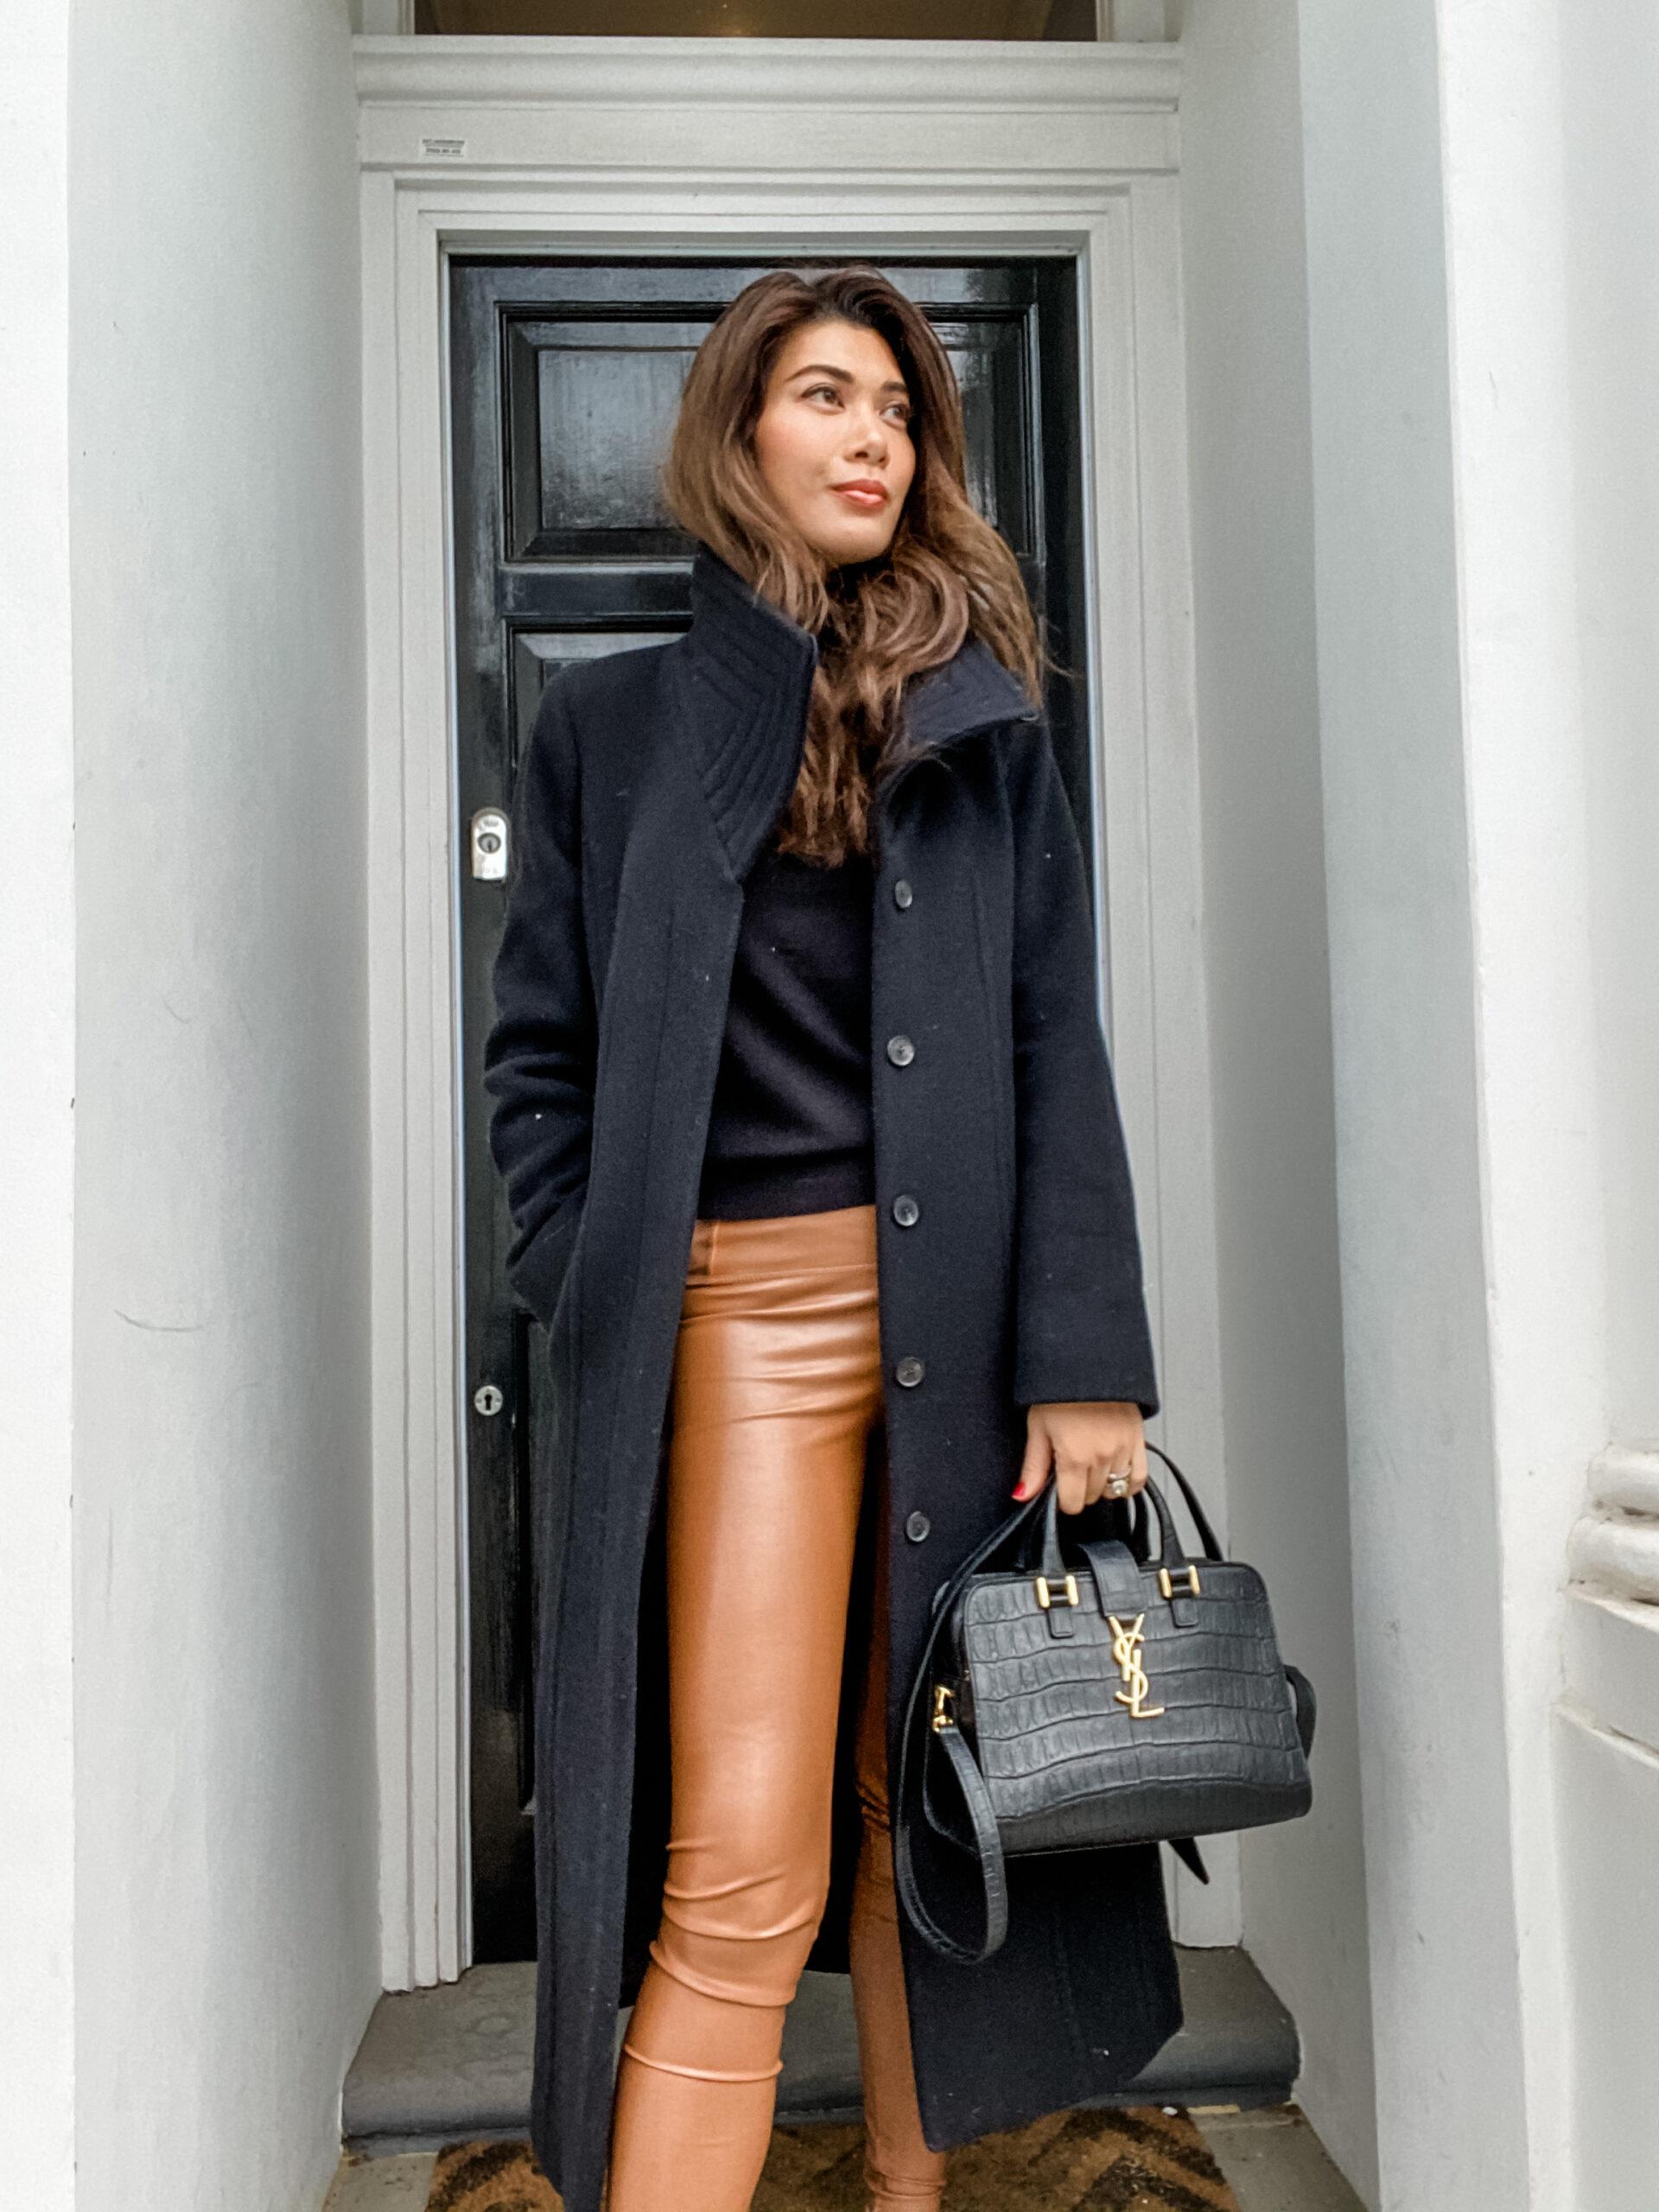 Chic & Warm in Aritzia & Zara